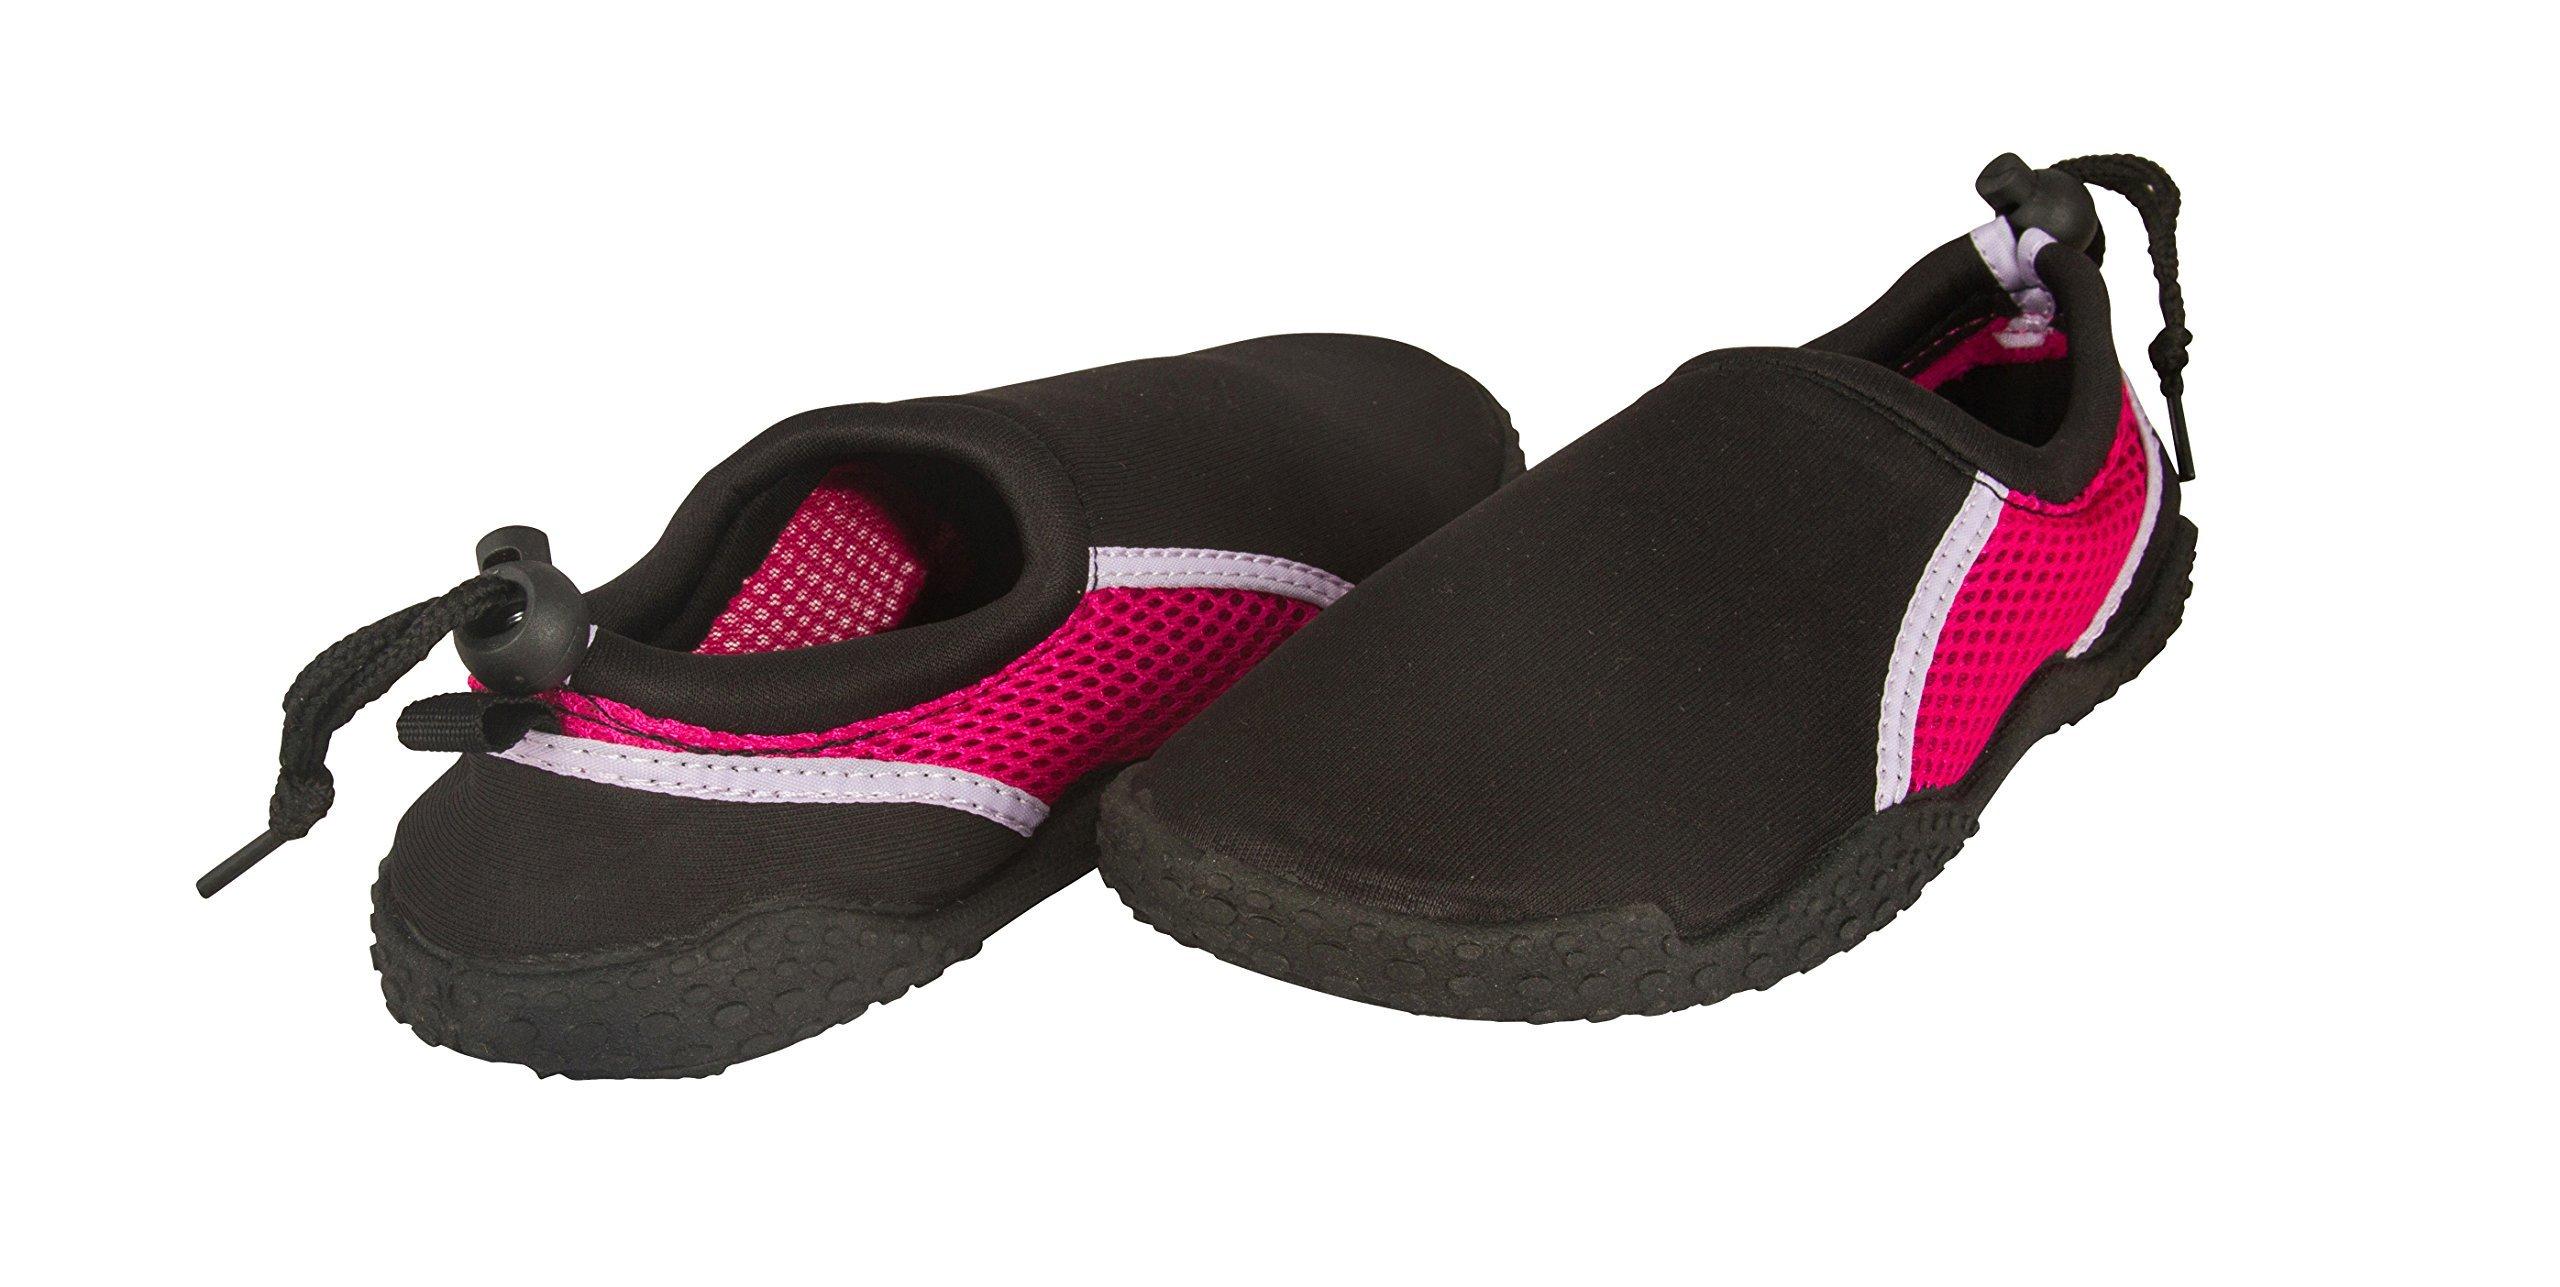 Shocked Toddler Neoprene and Mesh Water Beach Shoe Size 7-8 Black/Fuchsia/Lilac